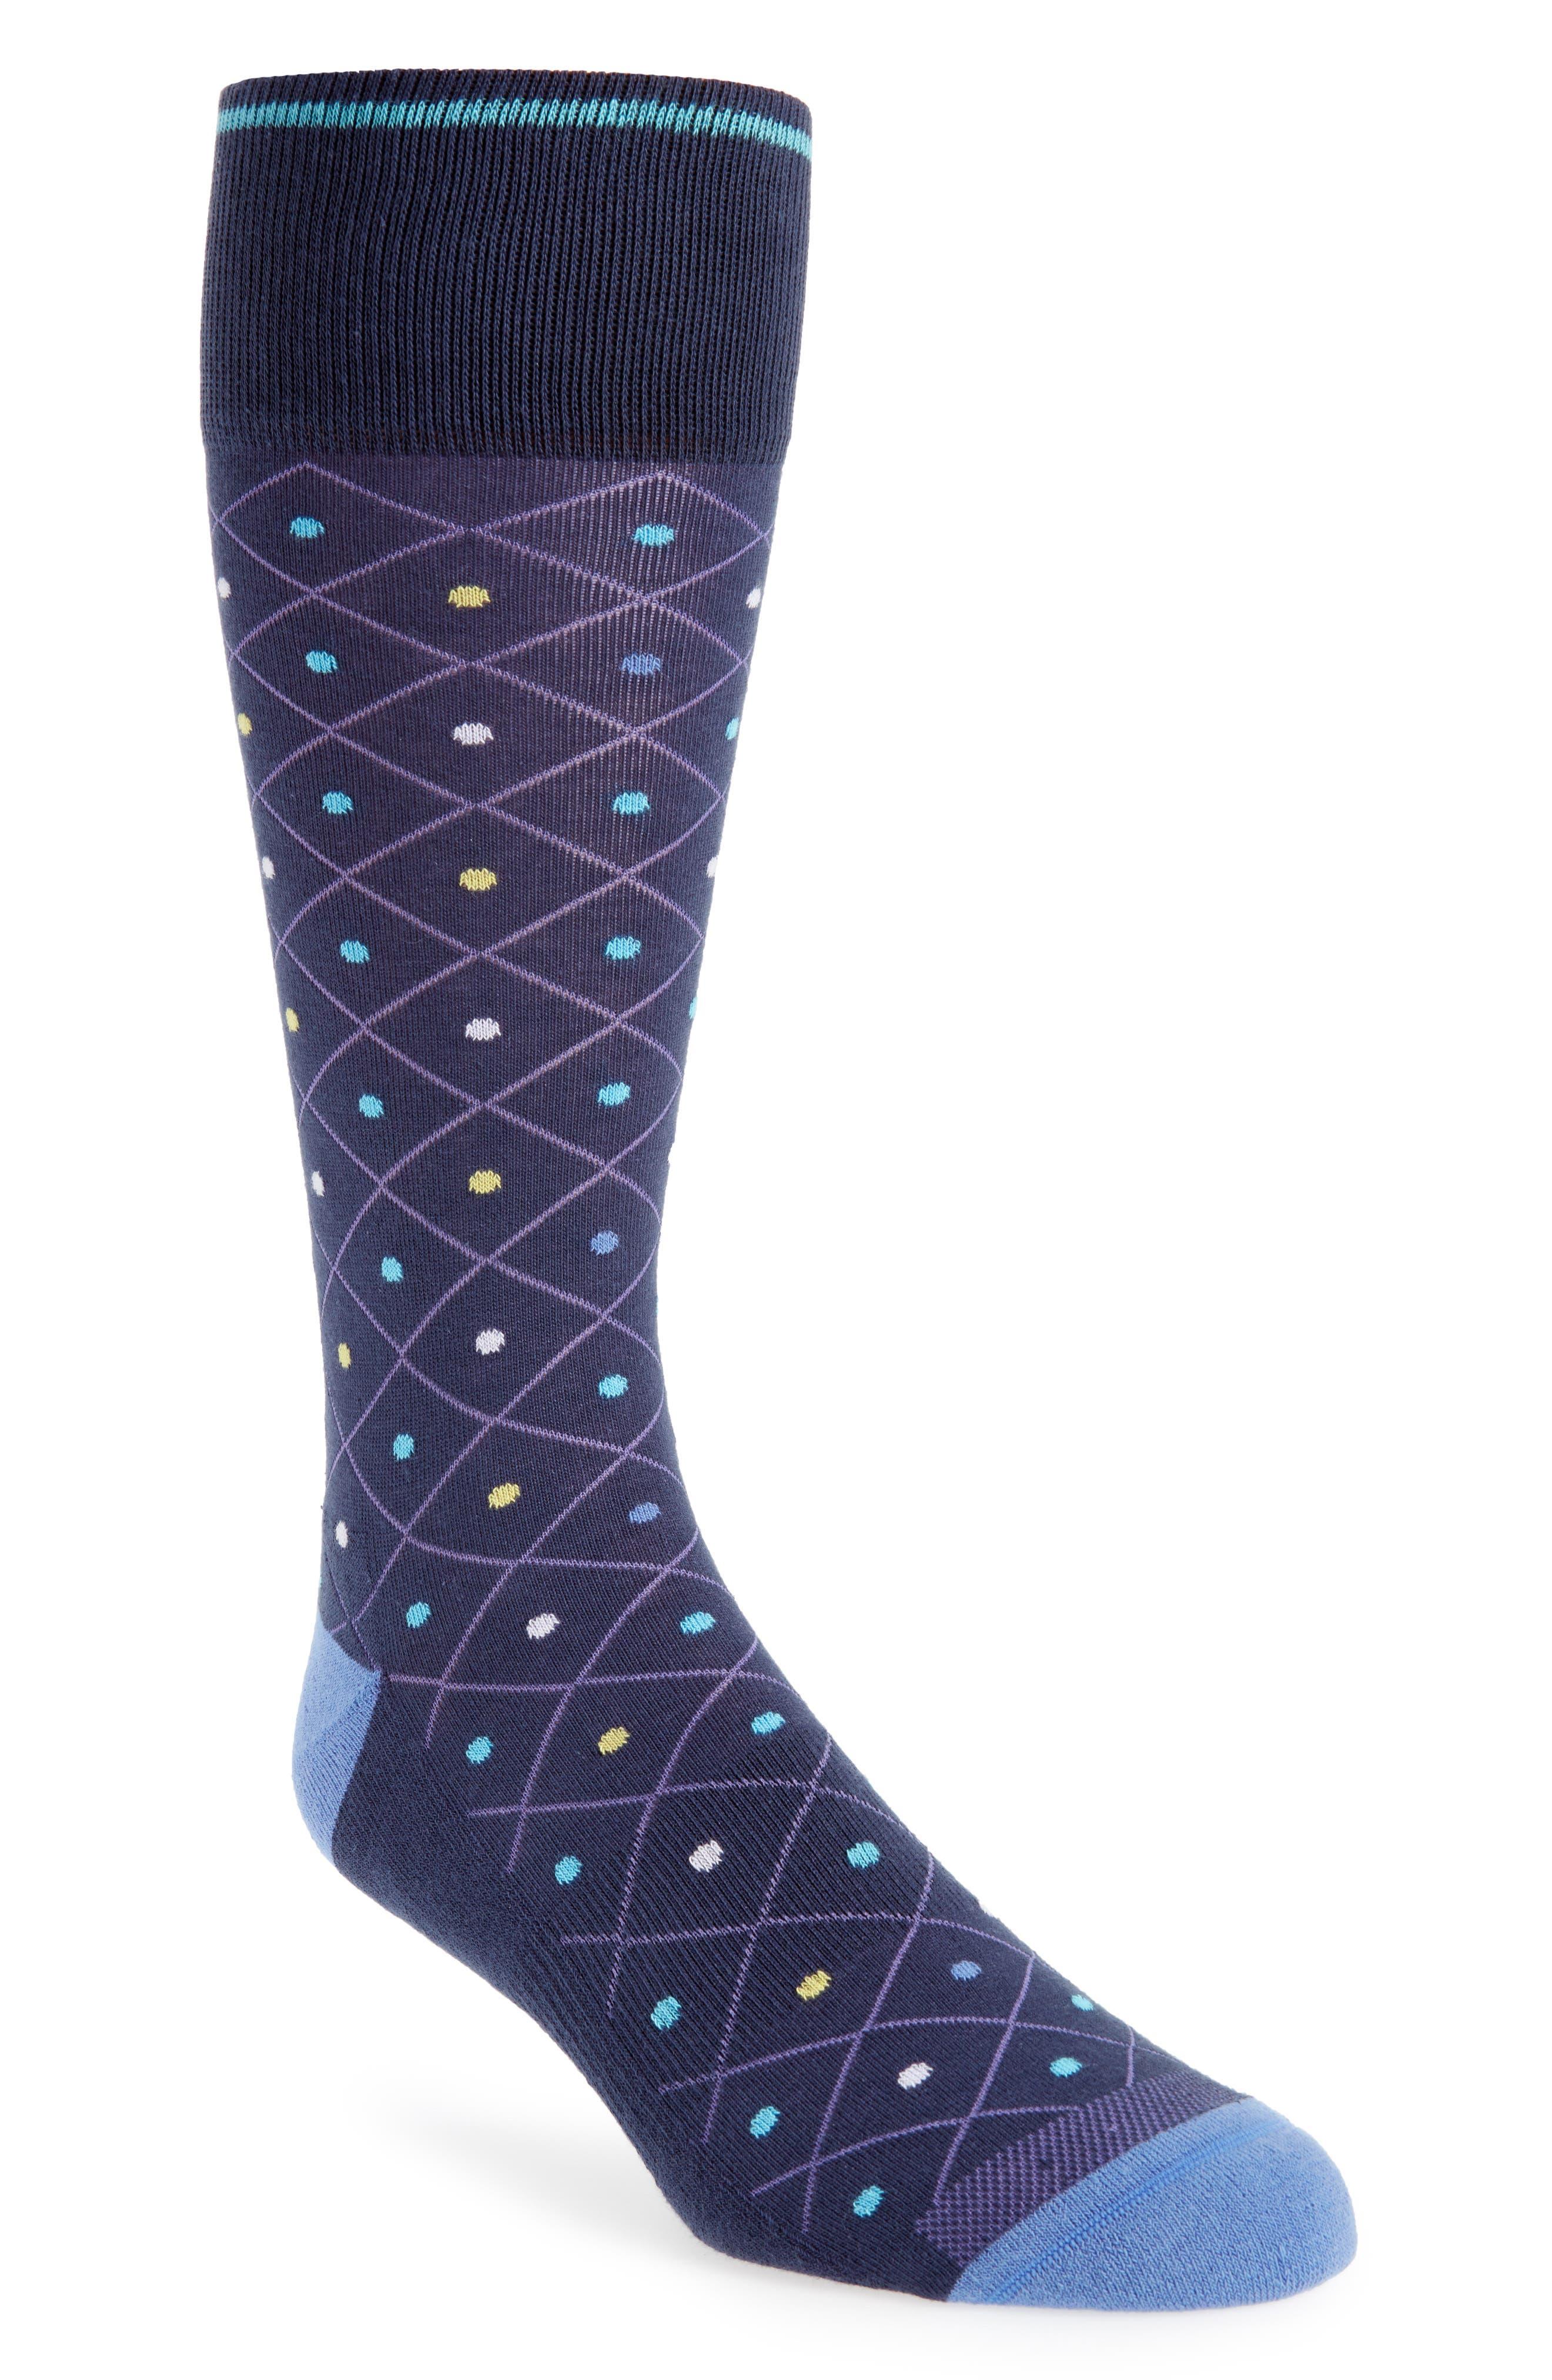 John W. Nordstrom® Pointed Grid Socks